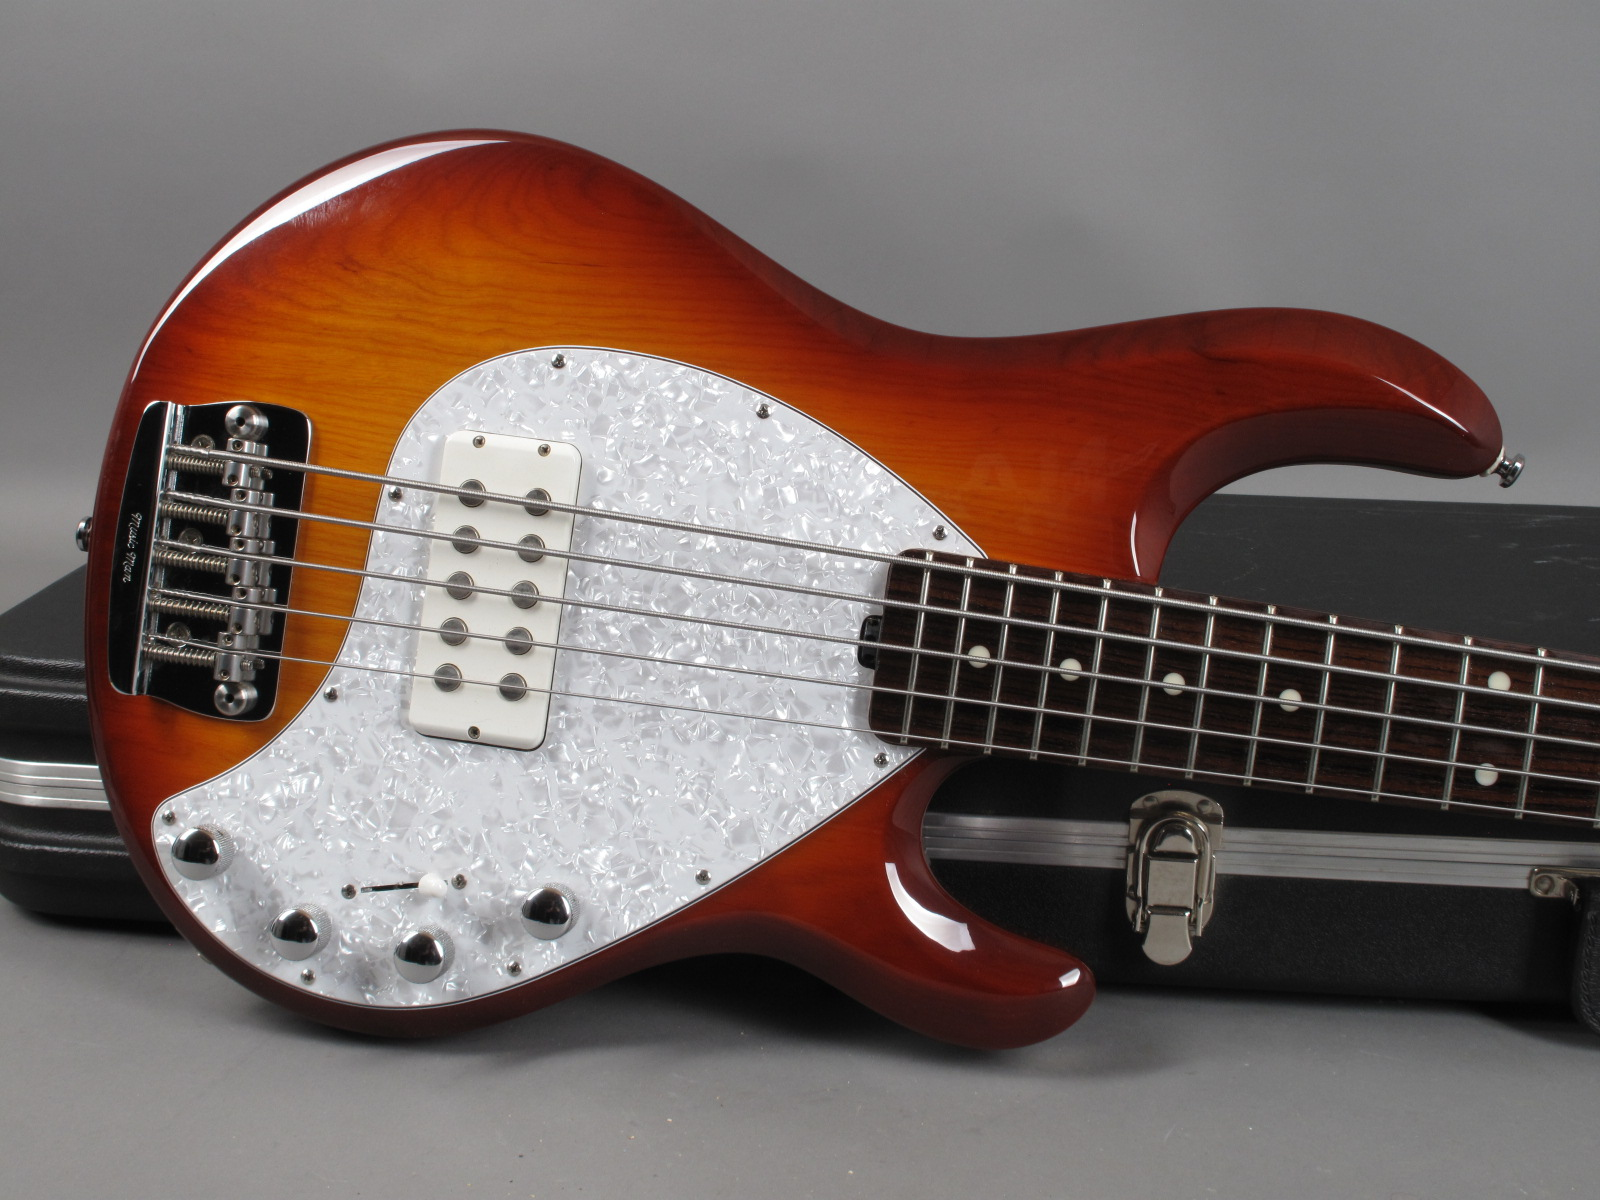 https://guitarpoint.de/app/uploads/products/2002-music-man-stingray-5-honeyburst/2002-Musicman-StingRay-5-String-CSB-E27771-9.jpg